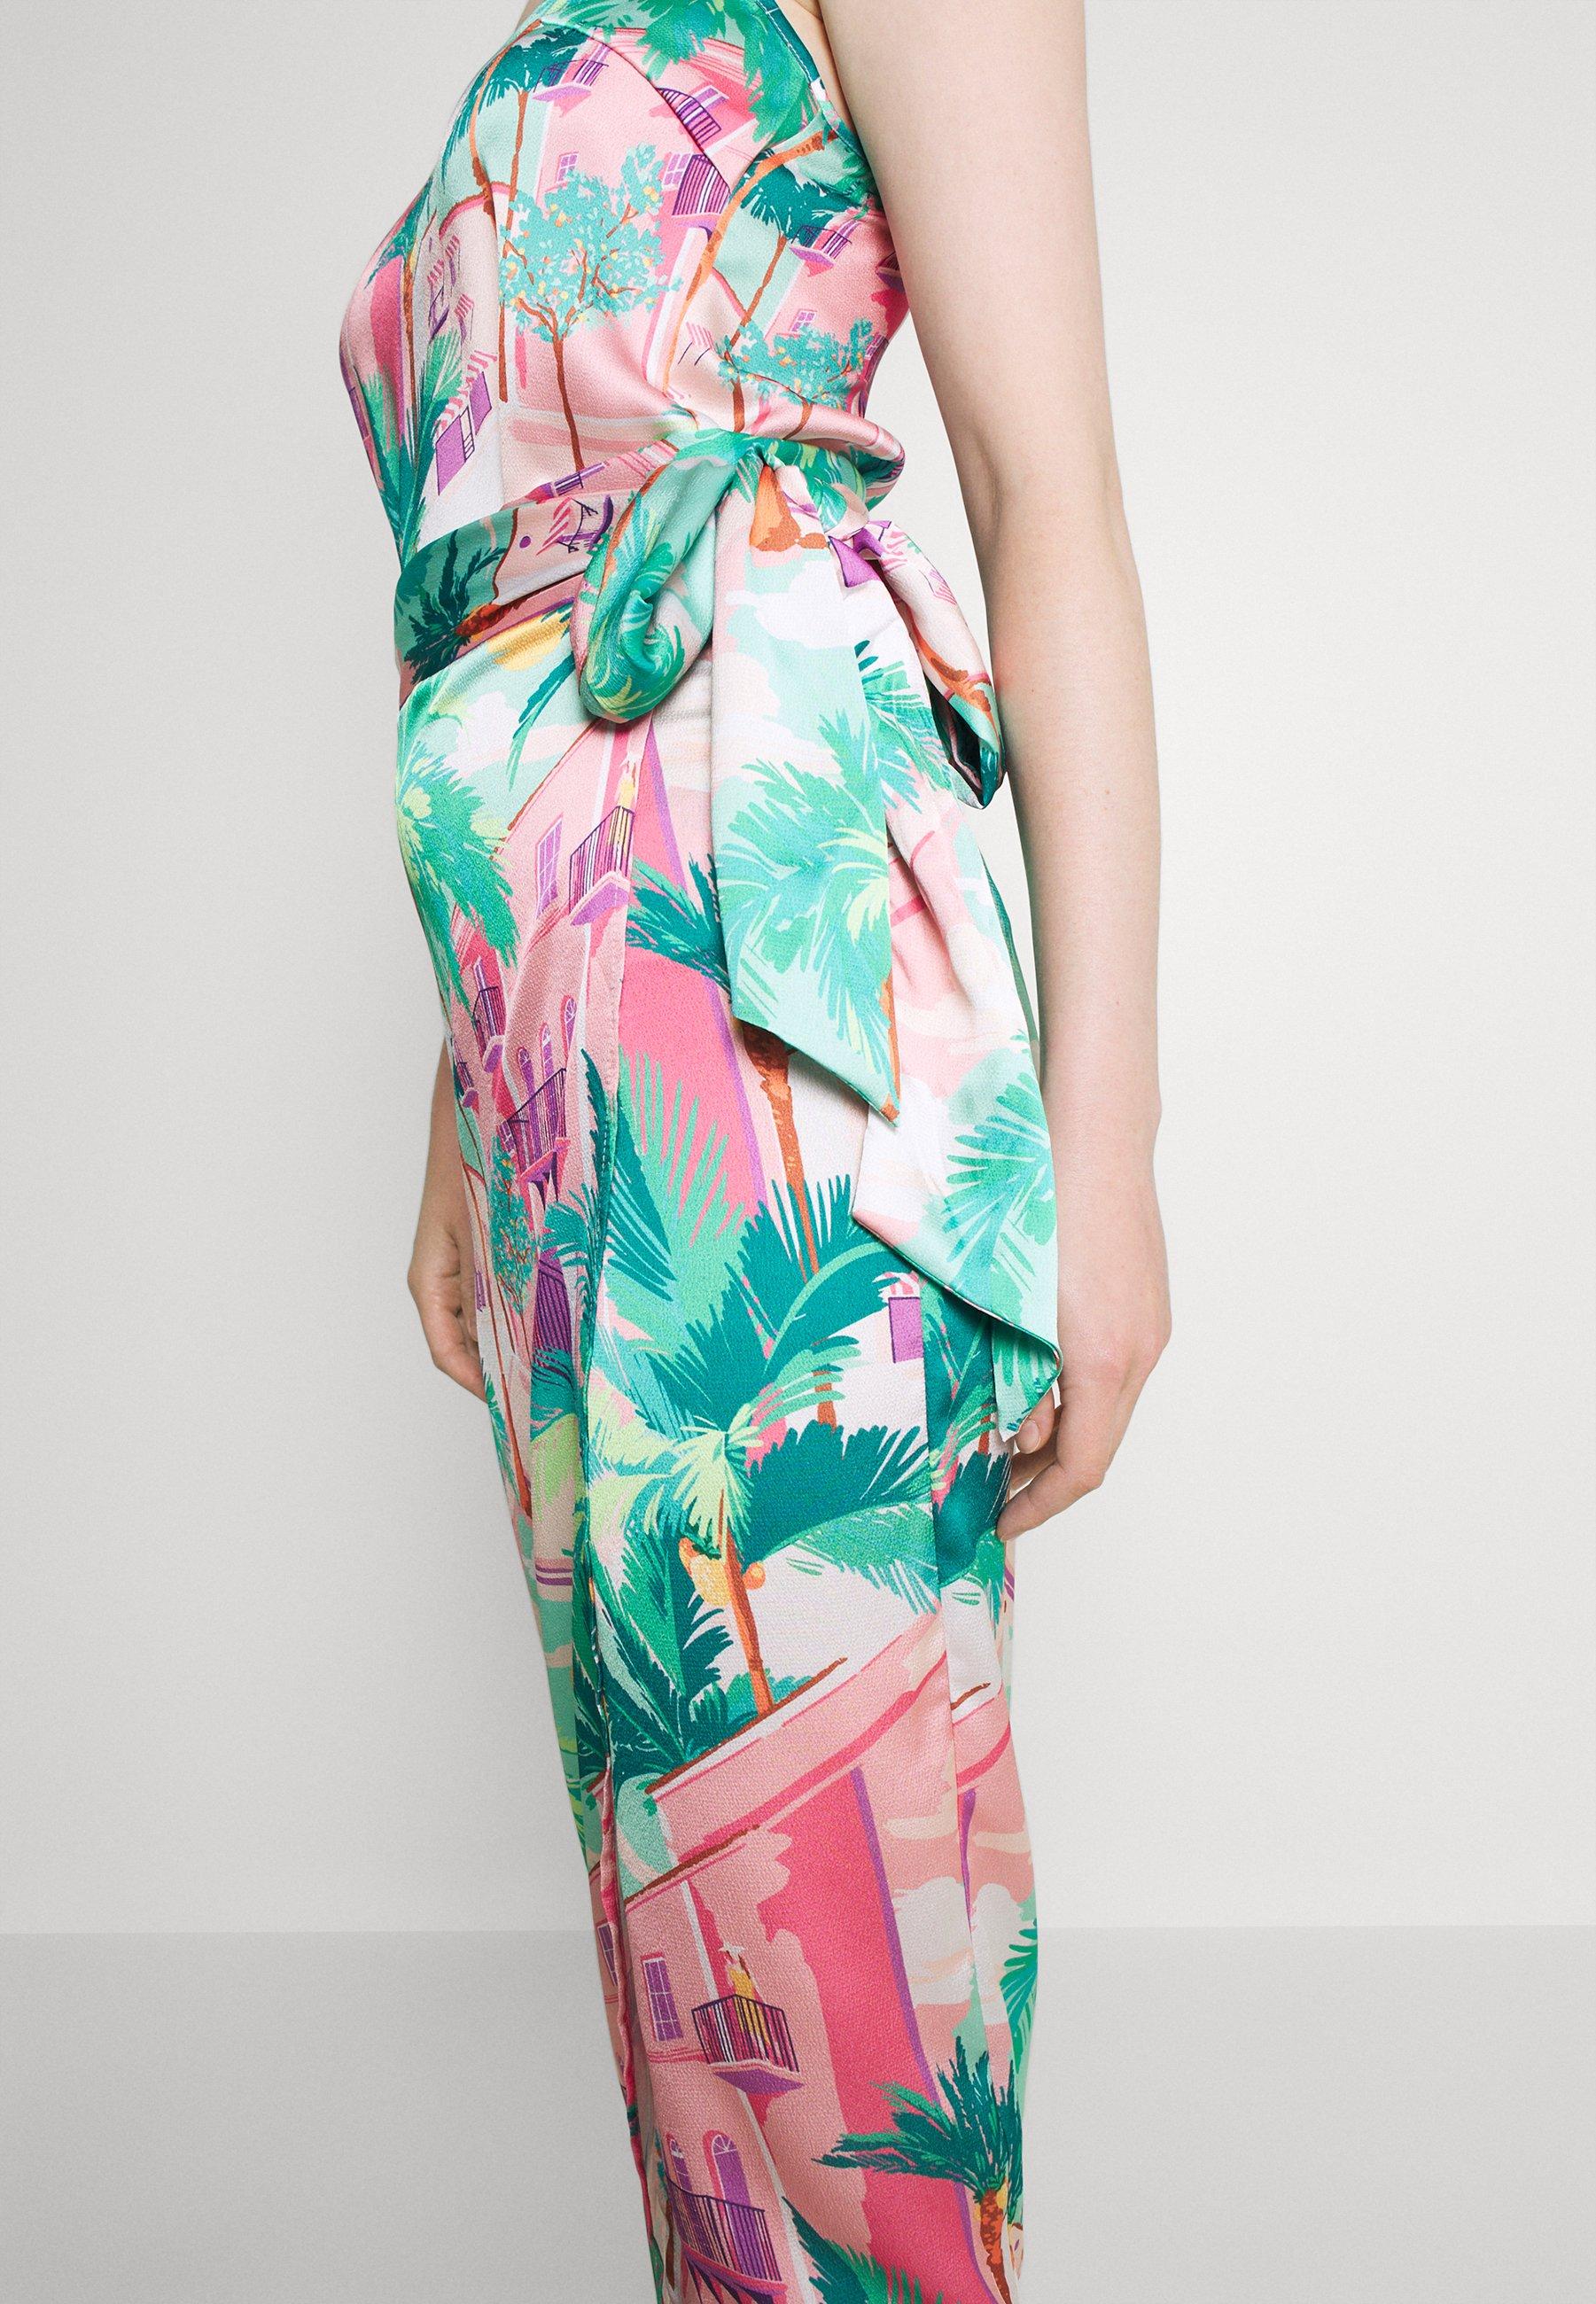 Femme SUMMER RAINBOW JASPRE - Jupe portefeuille